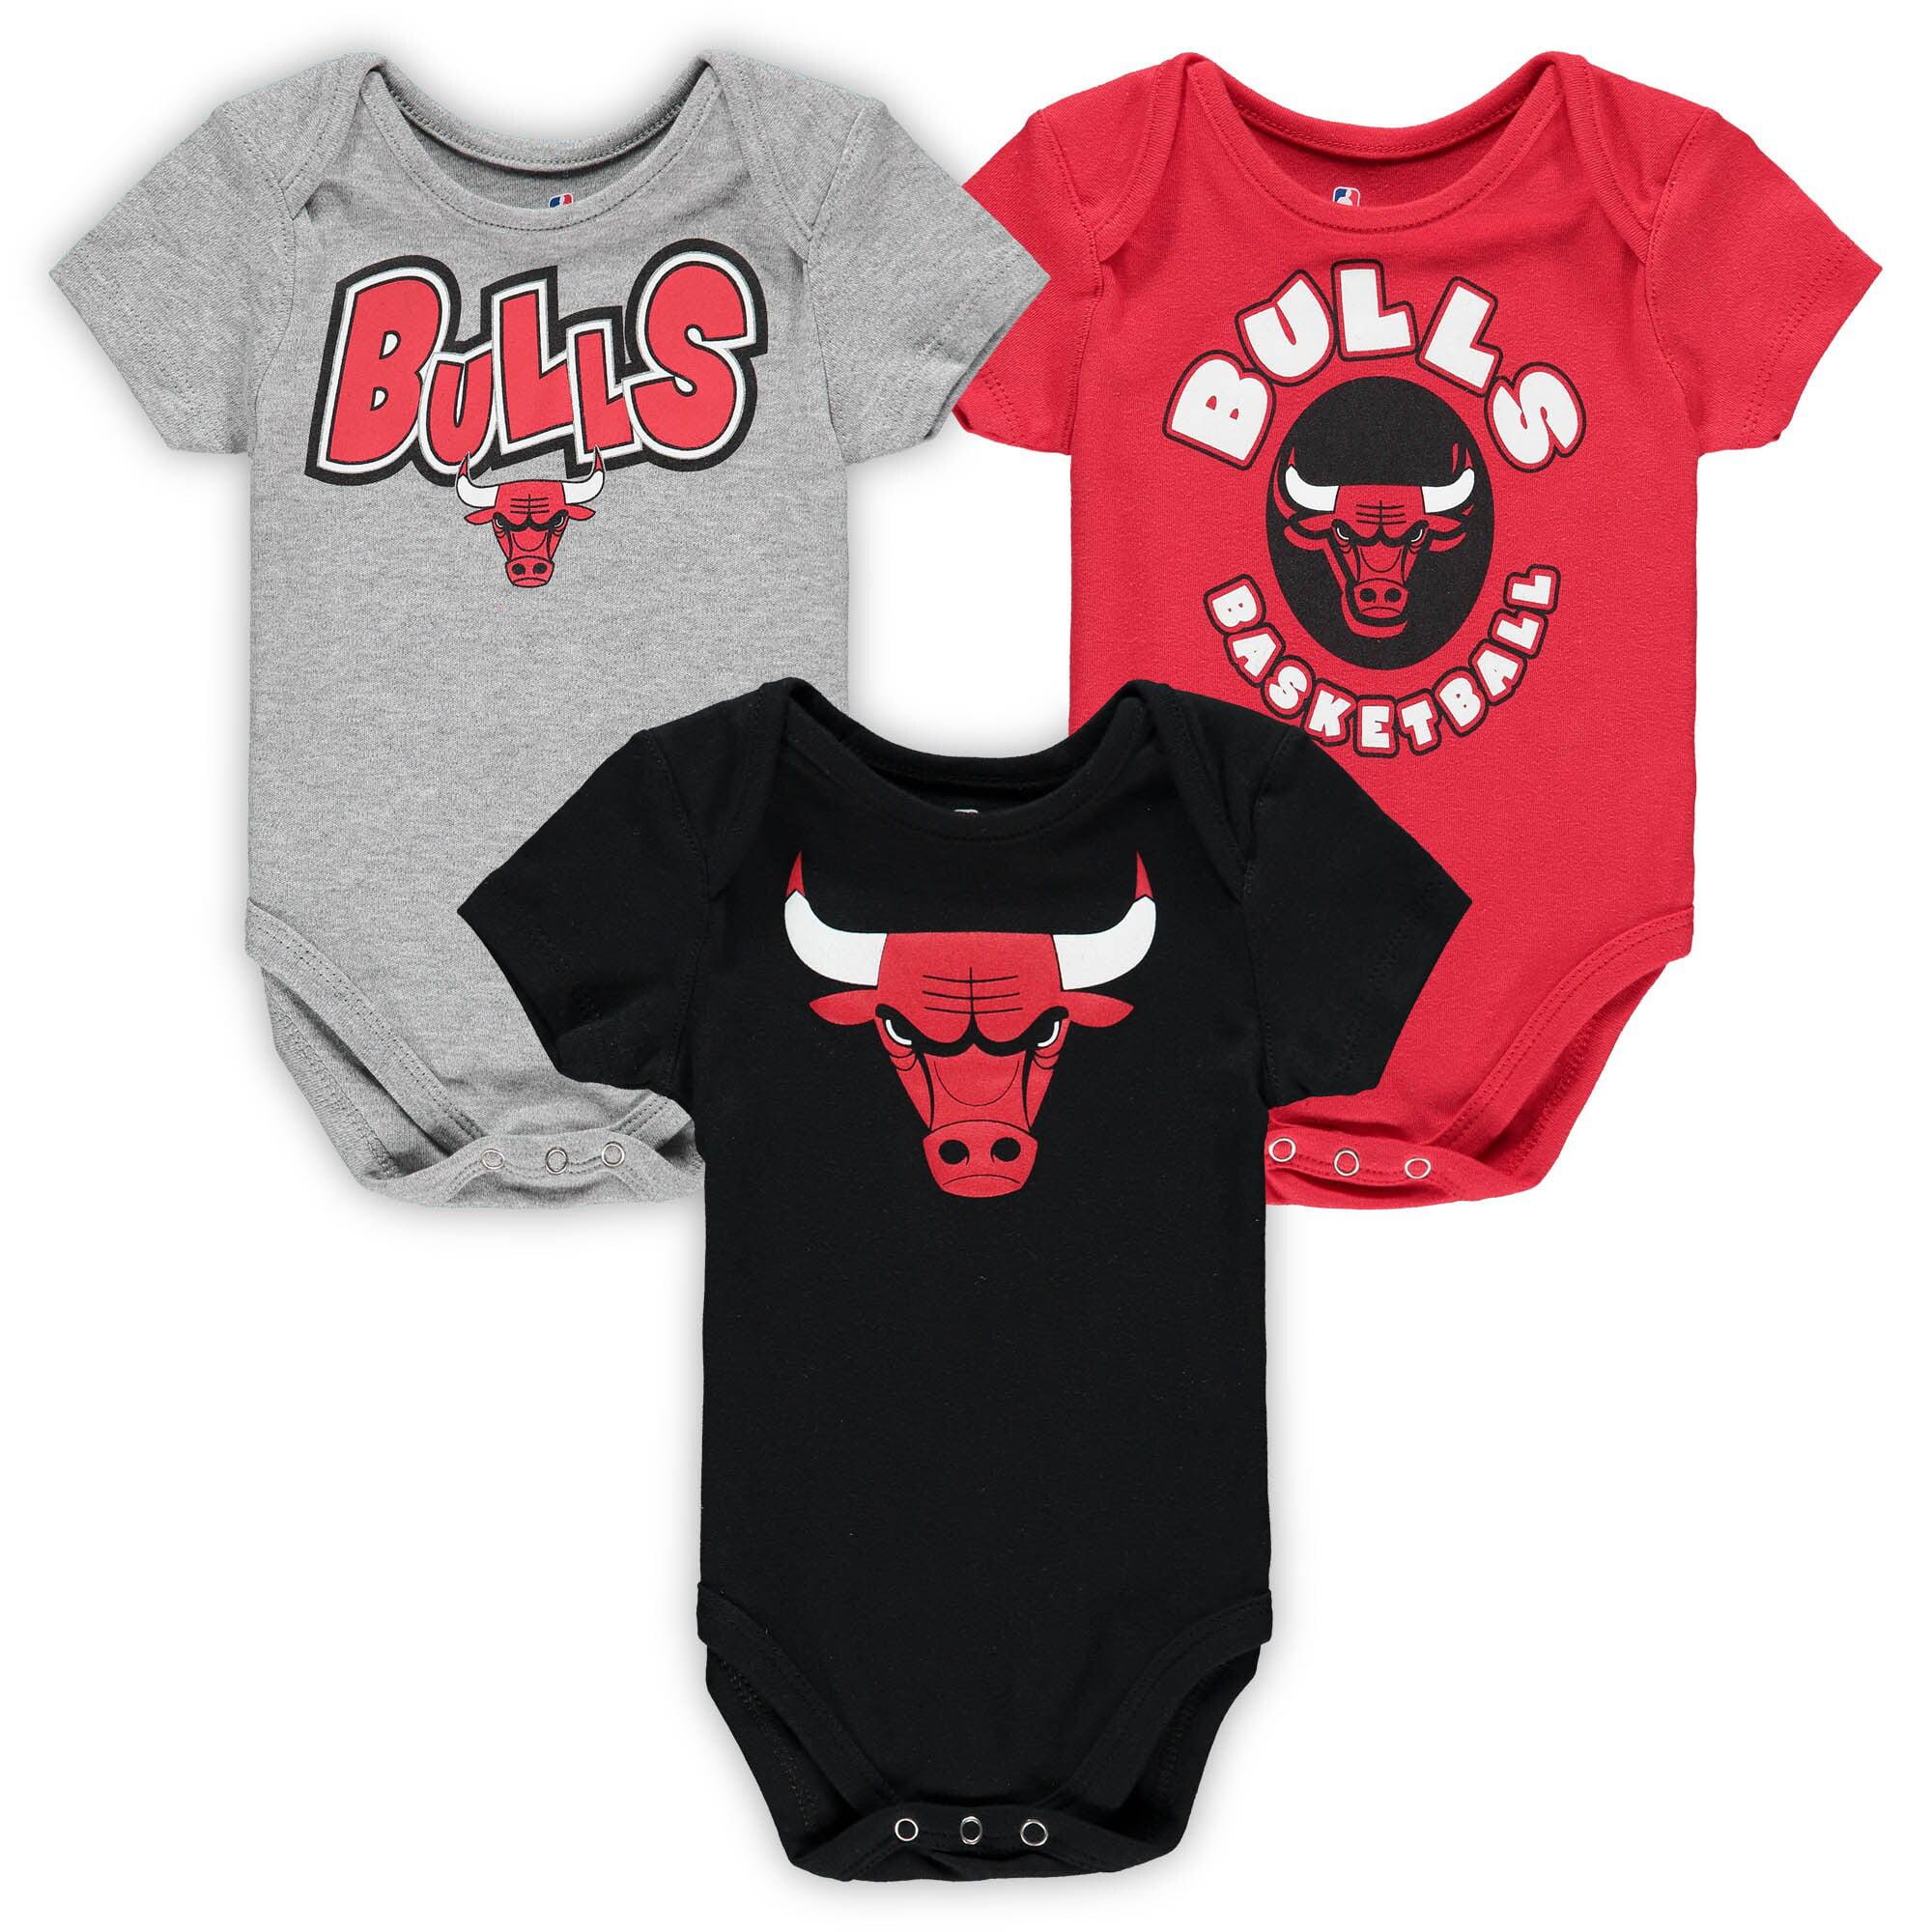 6-9 M OuterStuff Infant Louisville Cardinals Bodysuit Set Baby Sleeper /& Hat